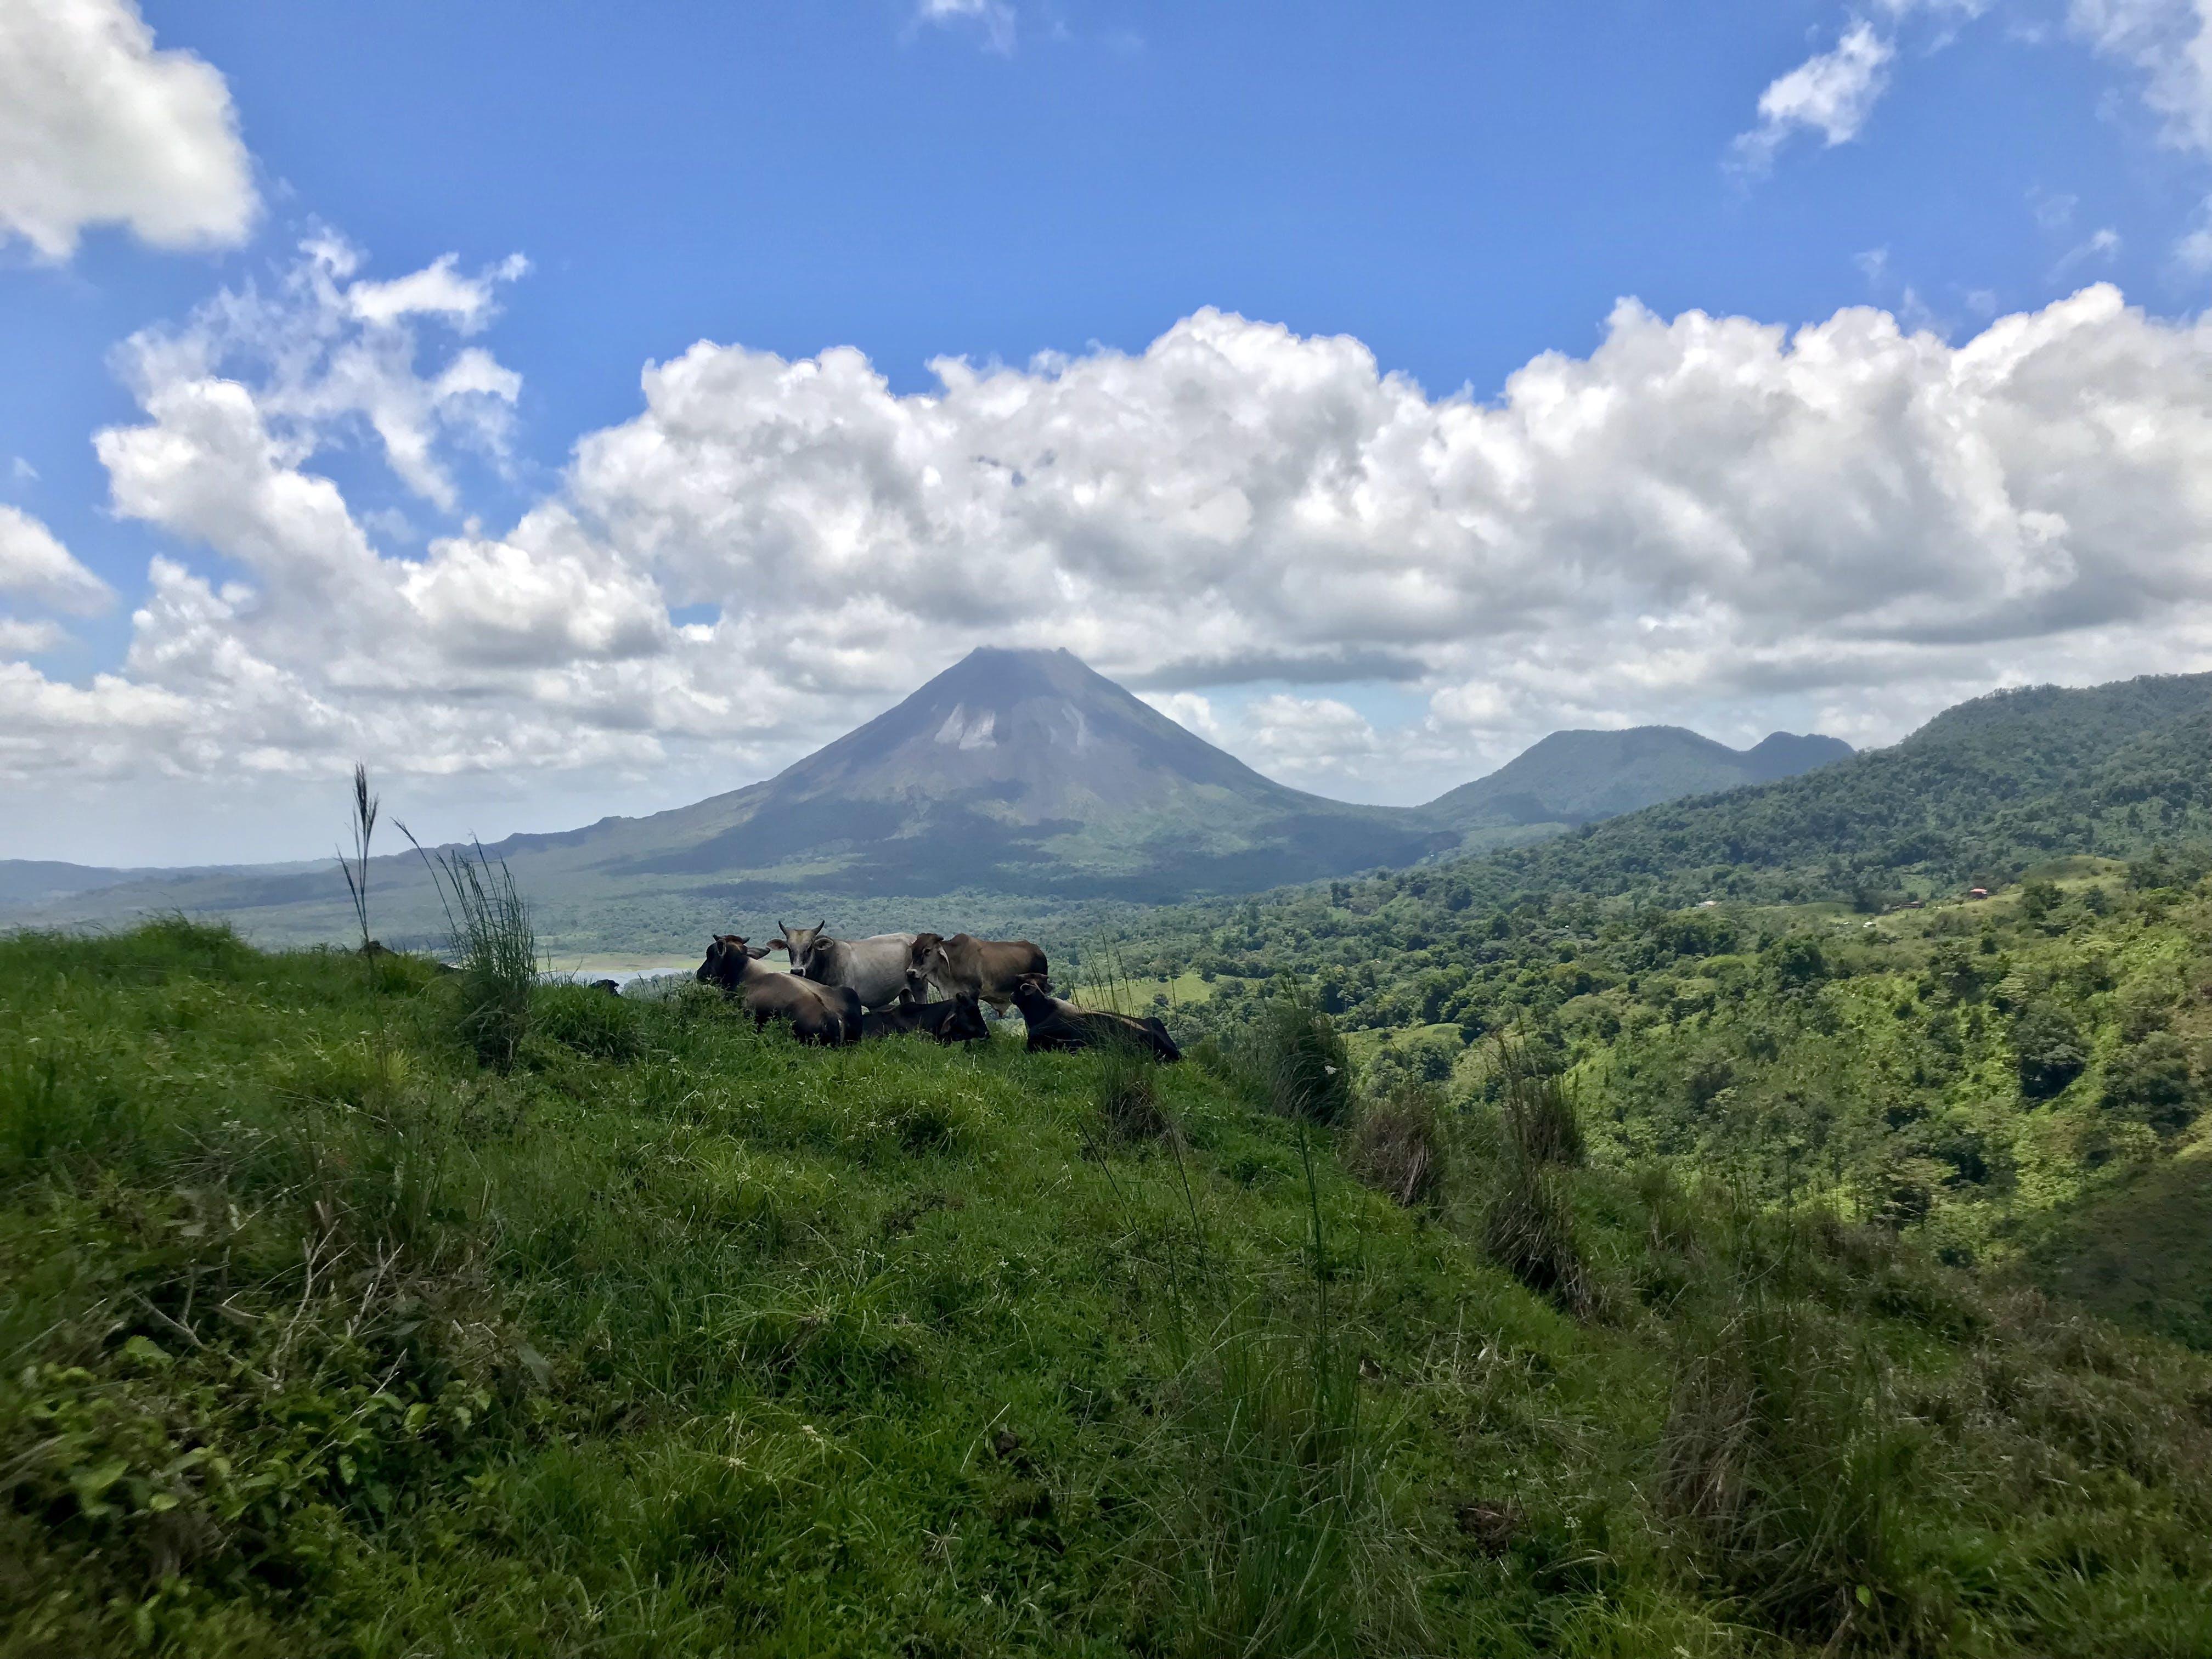 Free stock photo of backpackgezin.nl, Costa Rica, cows, El Castillo